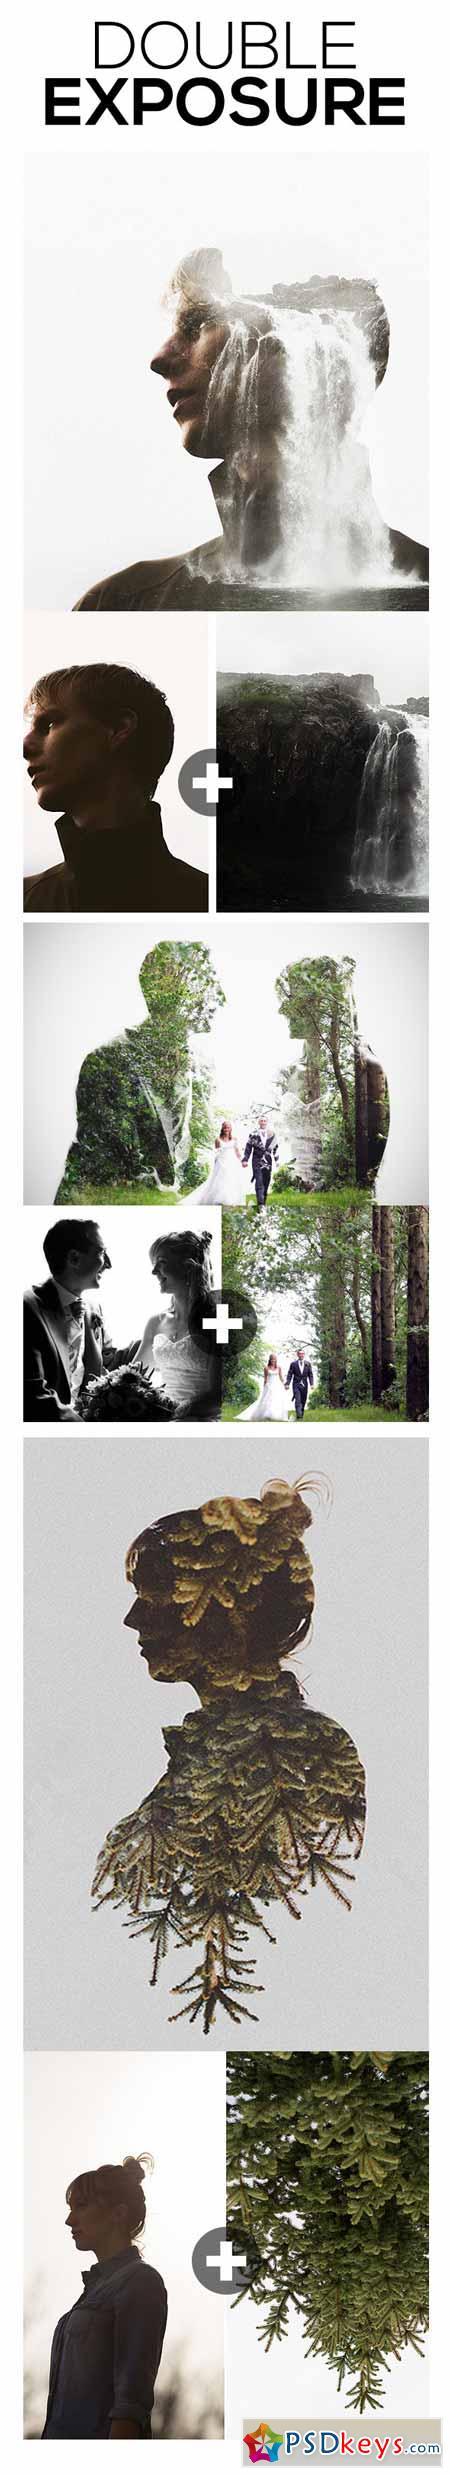 Double Exposure Photoshop Action 11617764